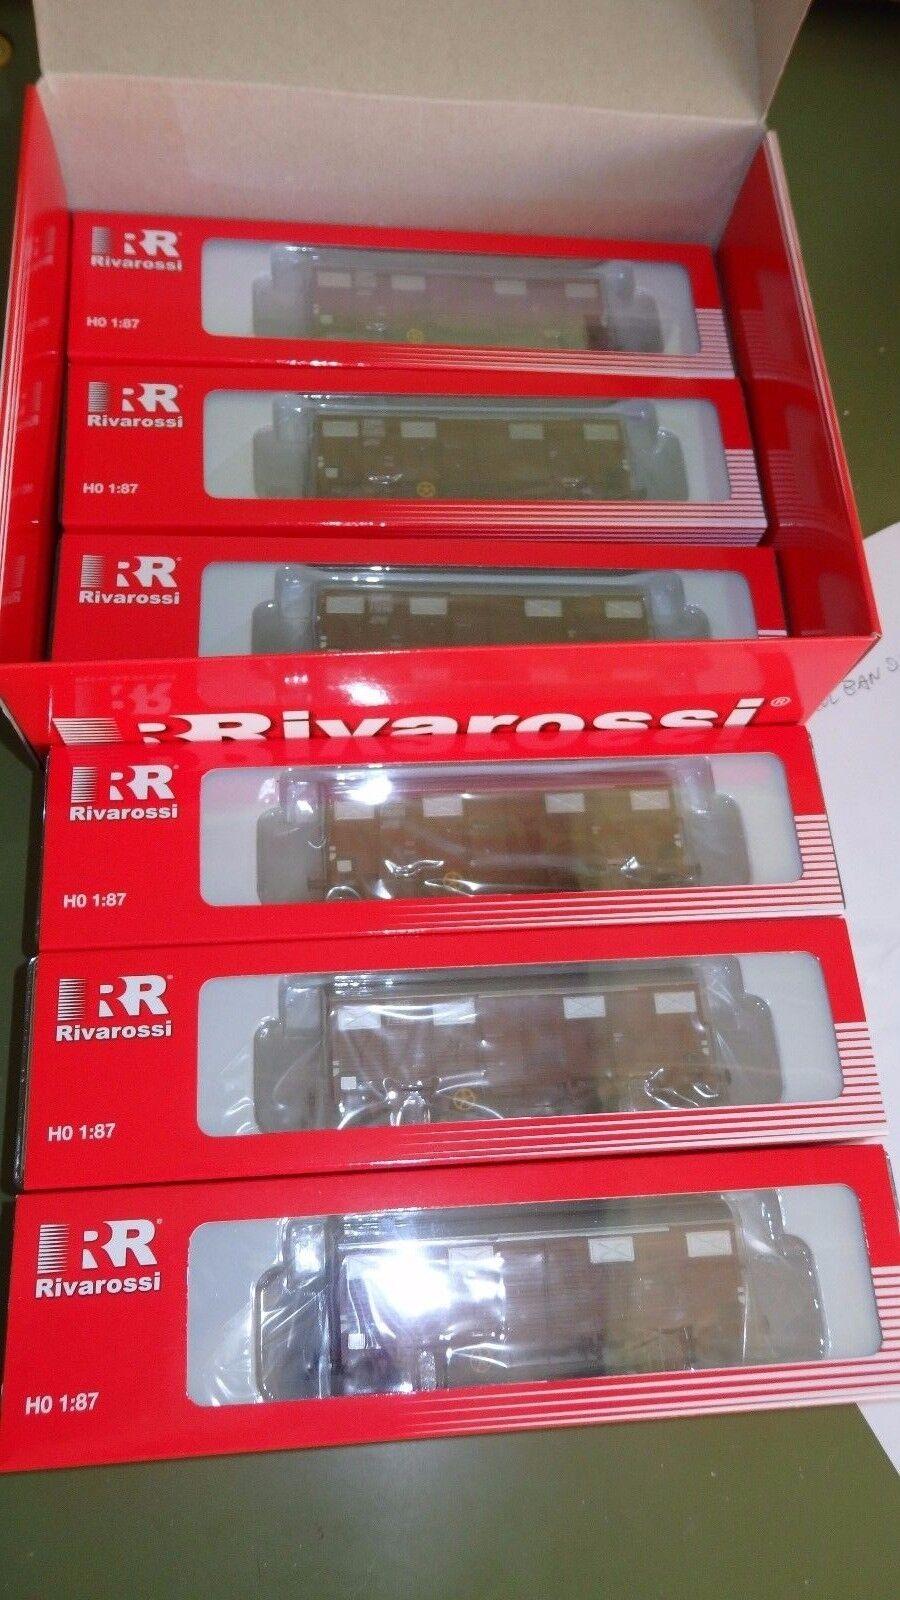 RIVAROSSI HR6224 Set Pansize con 6 vagónes cerrado Gs EUROP FS Italia,red